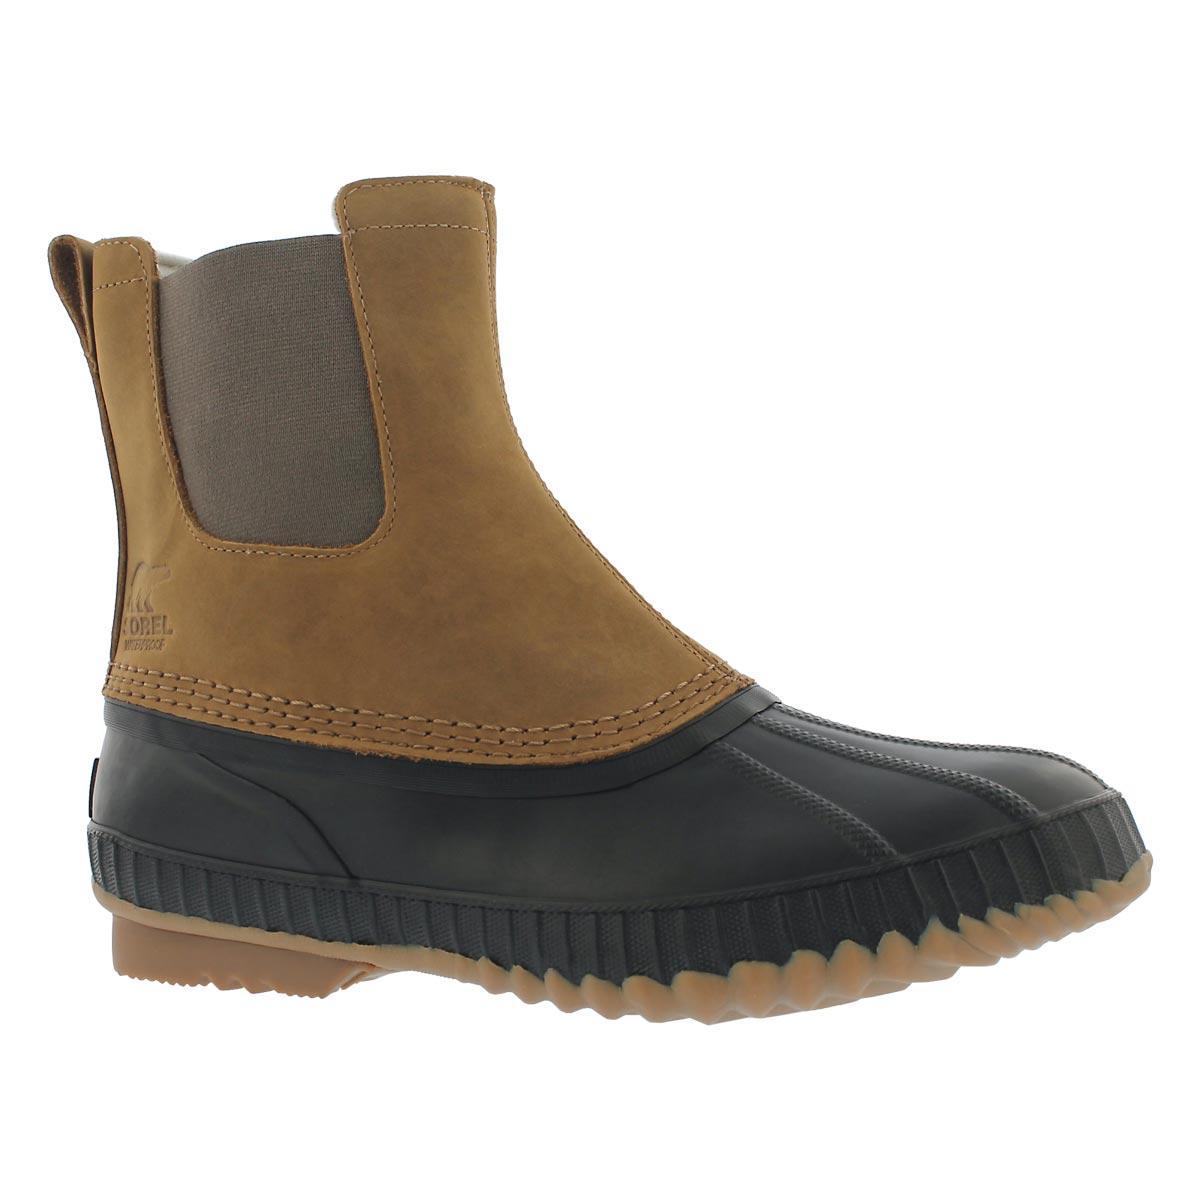 Men's CHEYANNE II chelsea elk waterproof boots